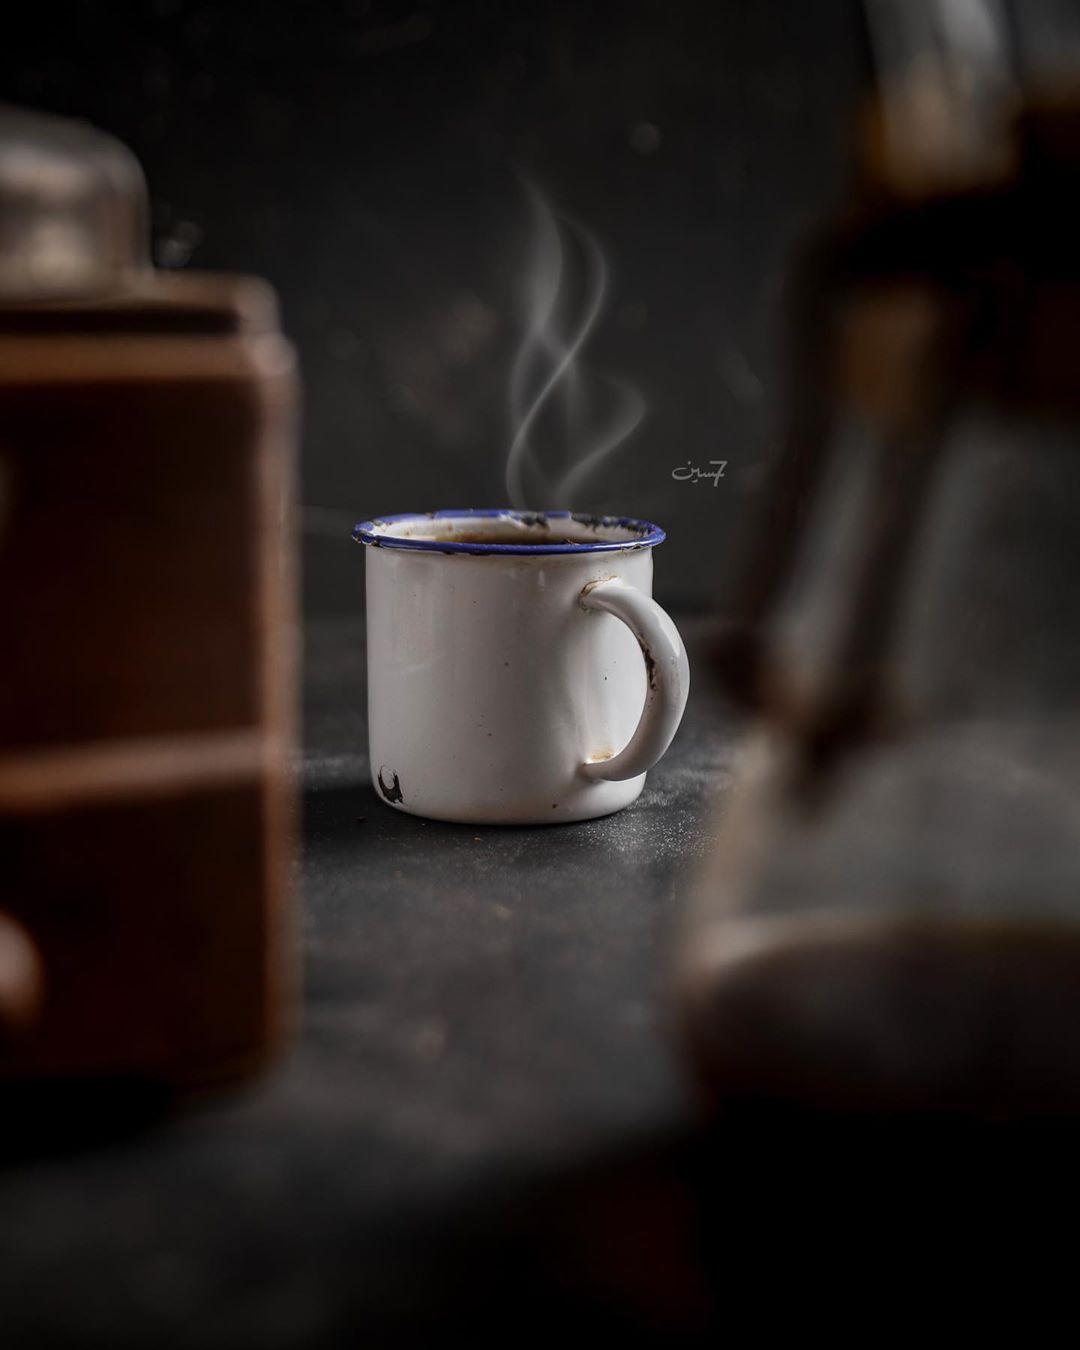 Coffee Stamp Photography Fujifilm Fujifilm35mm Foodphotography Stilllife Canon Food Drop Foodbackground Sidelight Godox Coffee Tableware Glassware